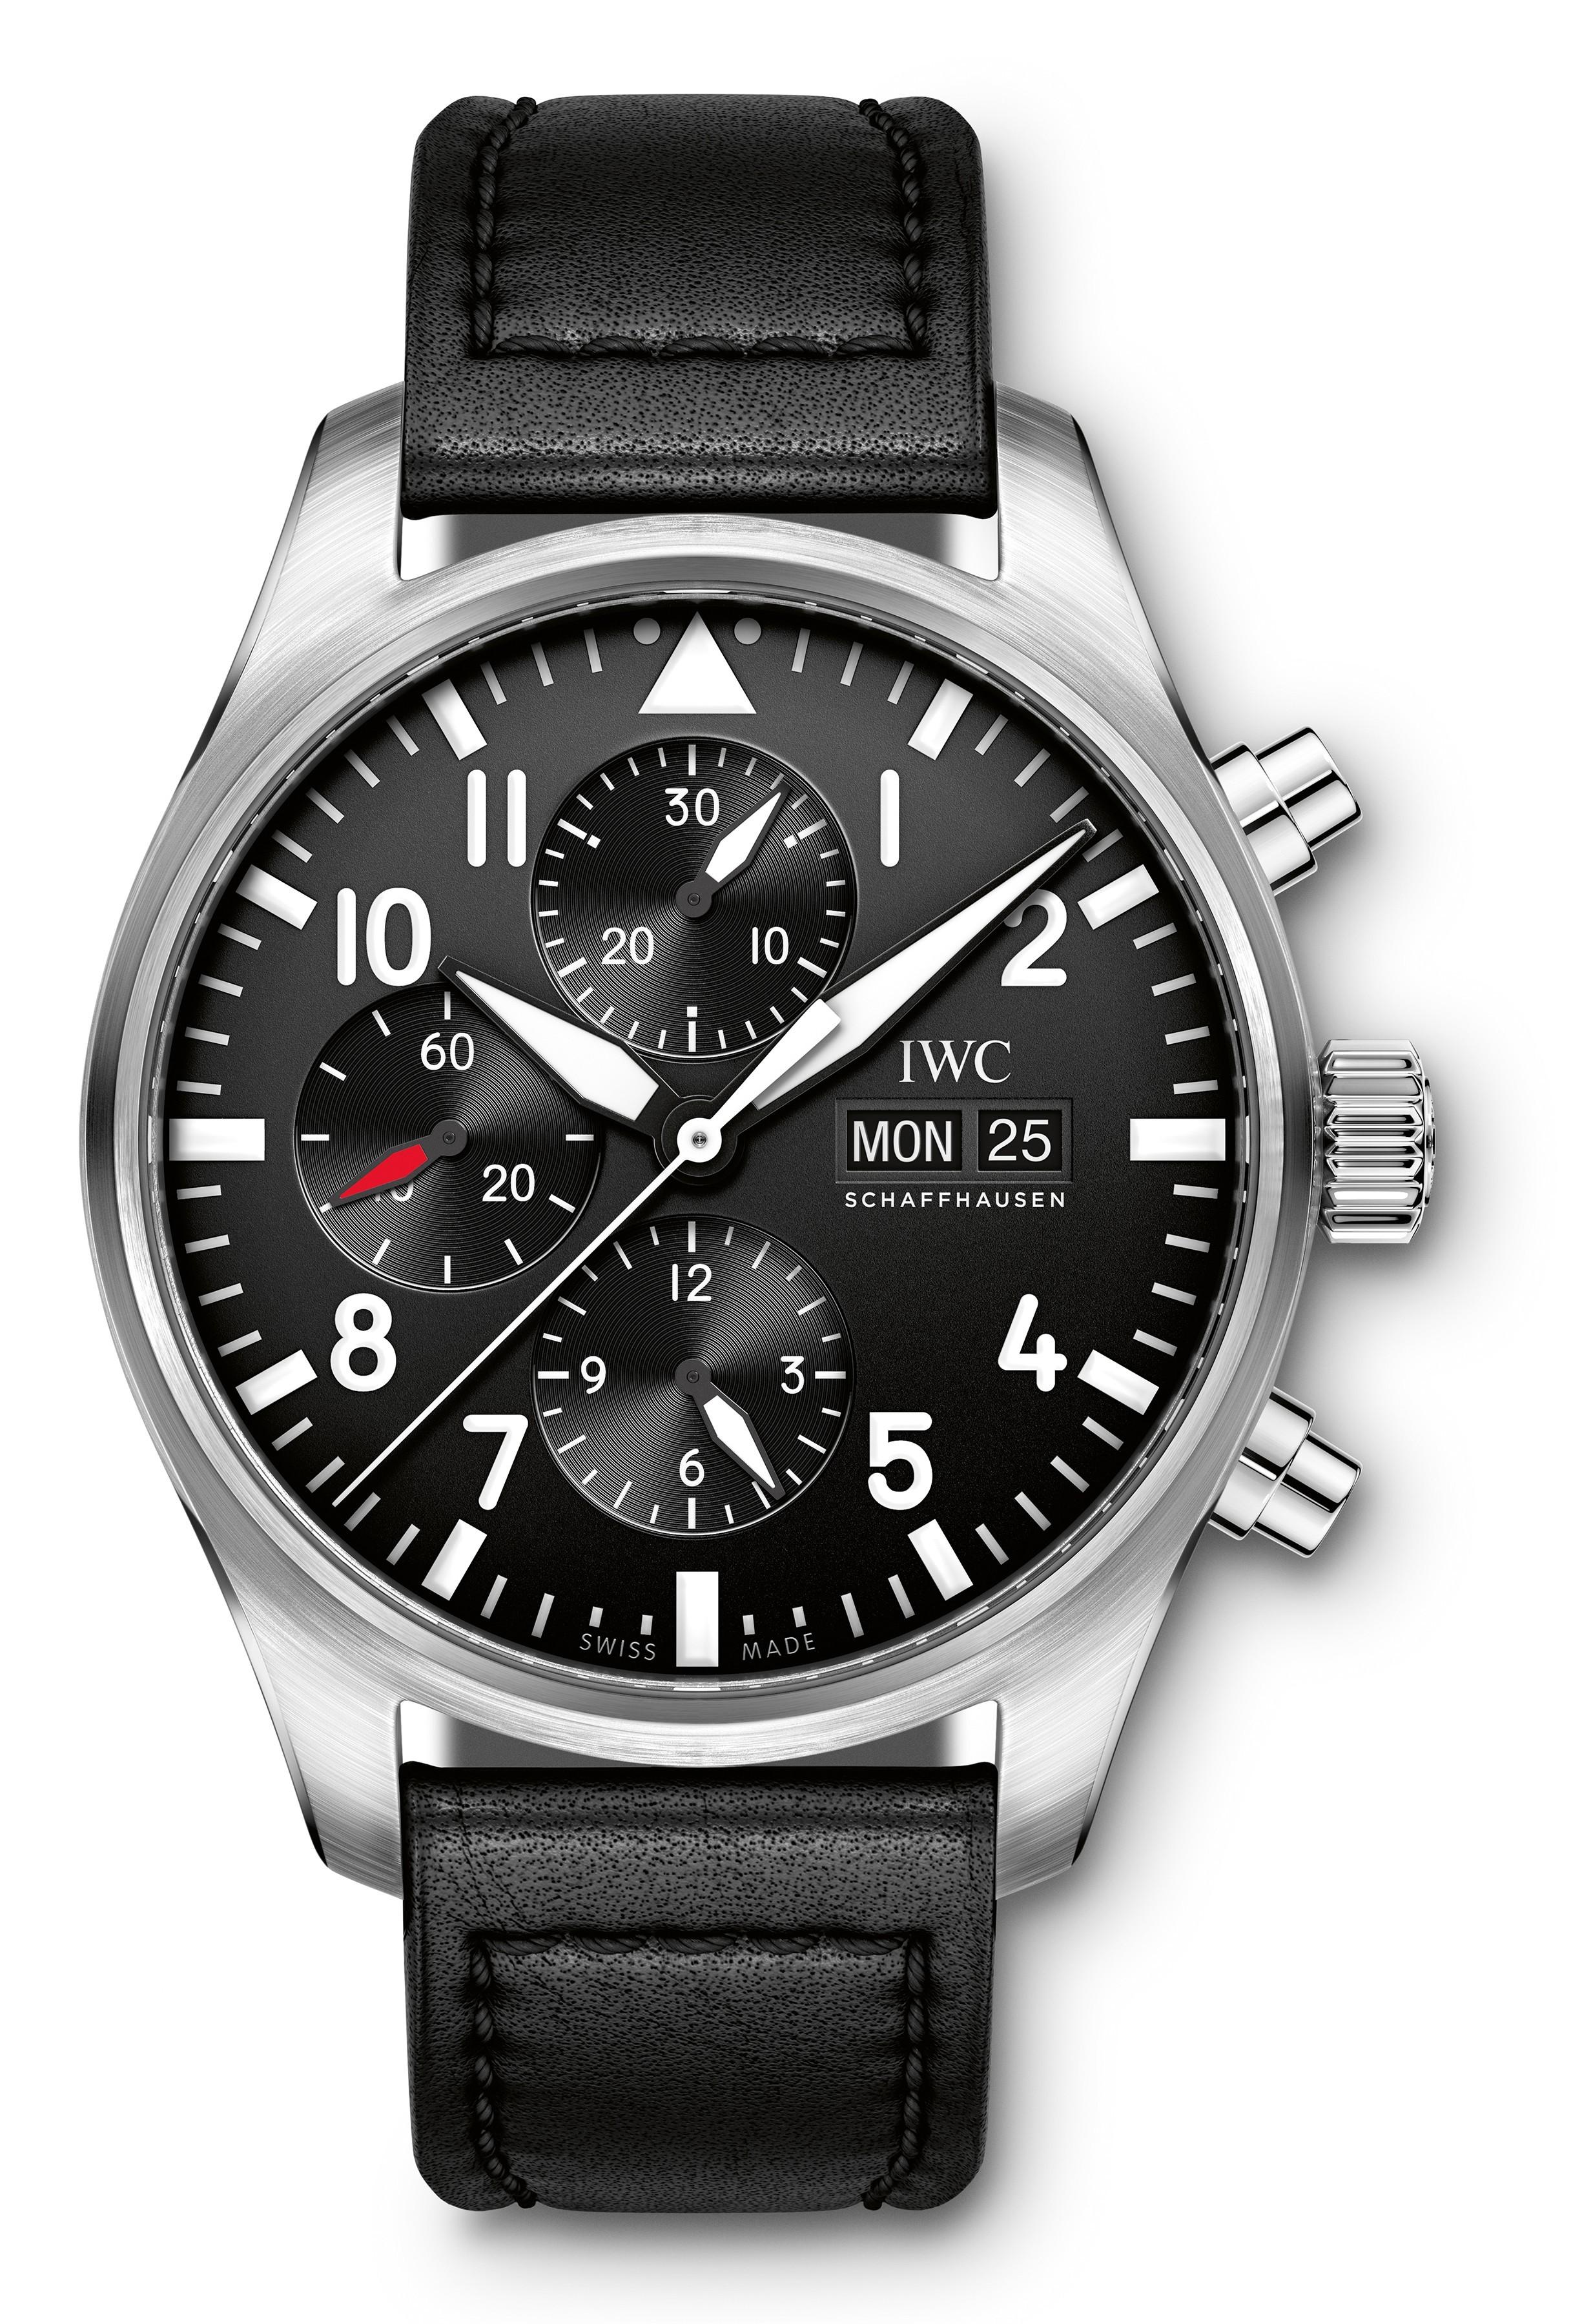 Calendario Anual Reloj Más Populares Iwc Reloj De Aviador Cron³grafo Iw3777 2016 Of Calendario Anual Reloj Más Reciente Calaméo Prensa Pitiusa Edici³n 237